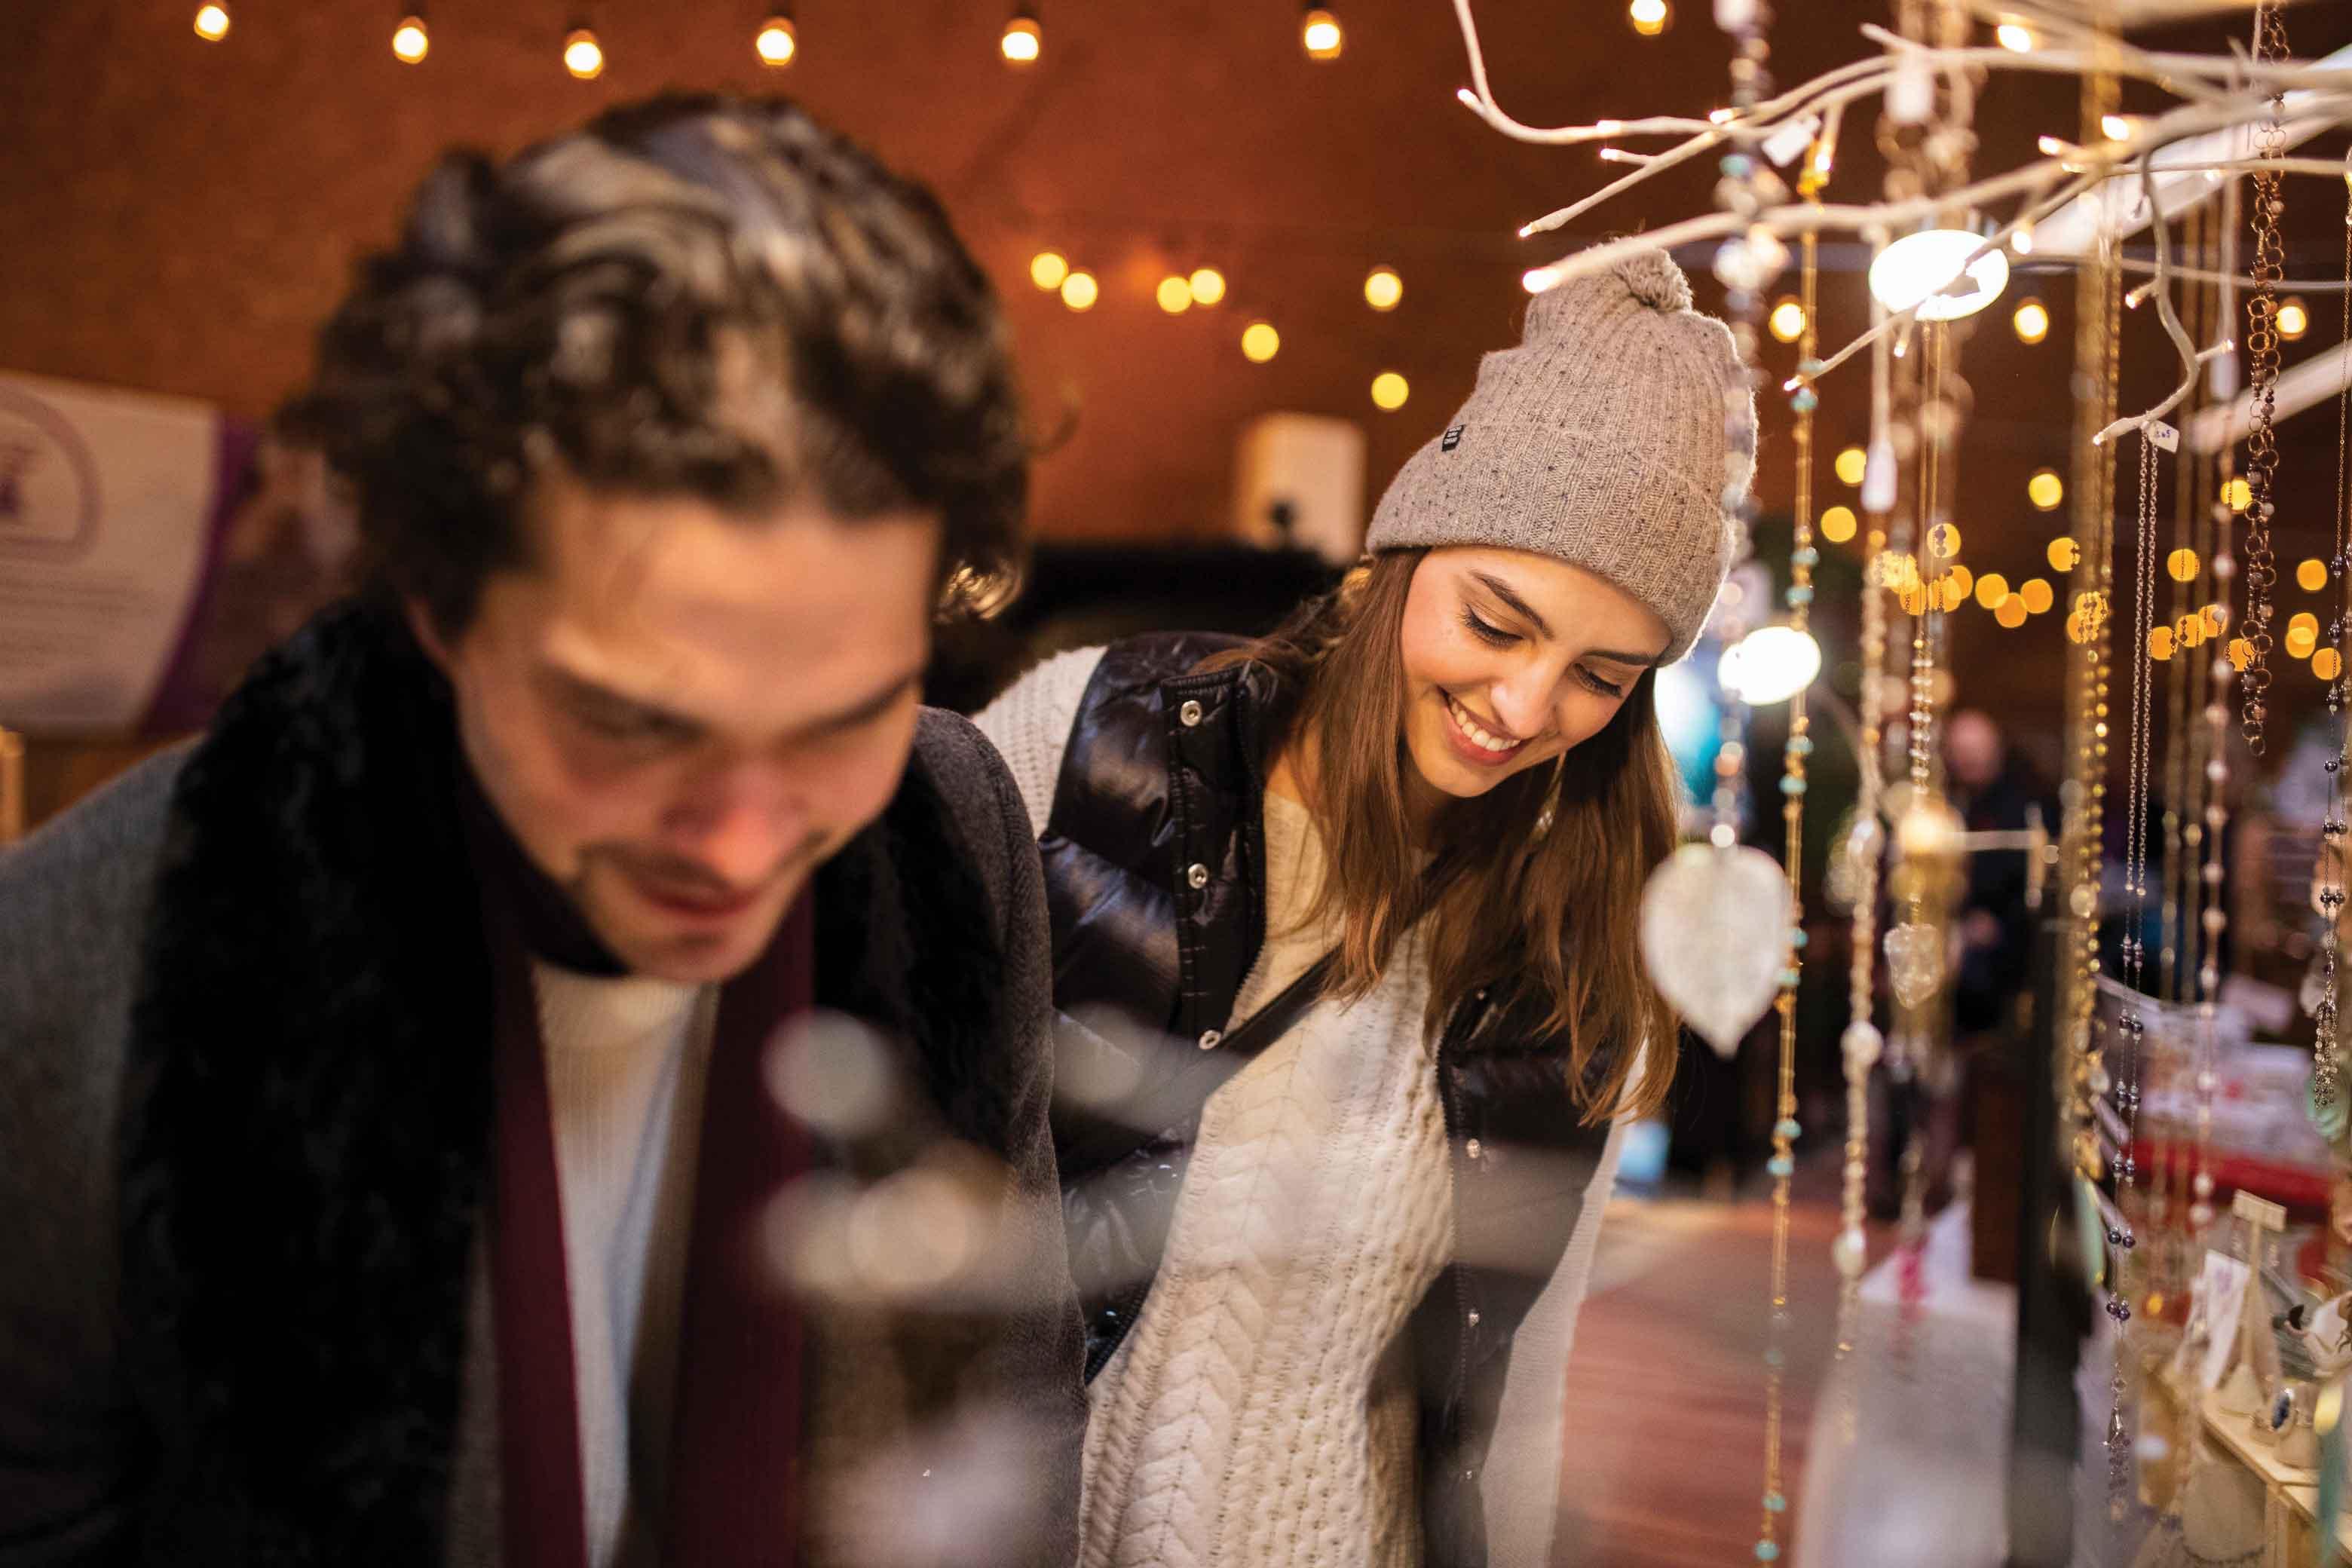 Nighttime Outdoor Adventures Banff Christmas Market